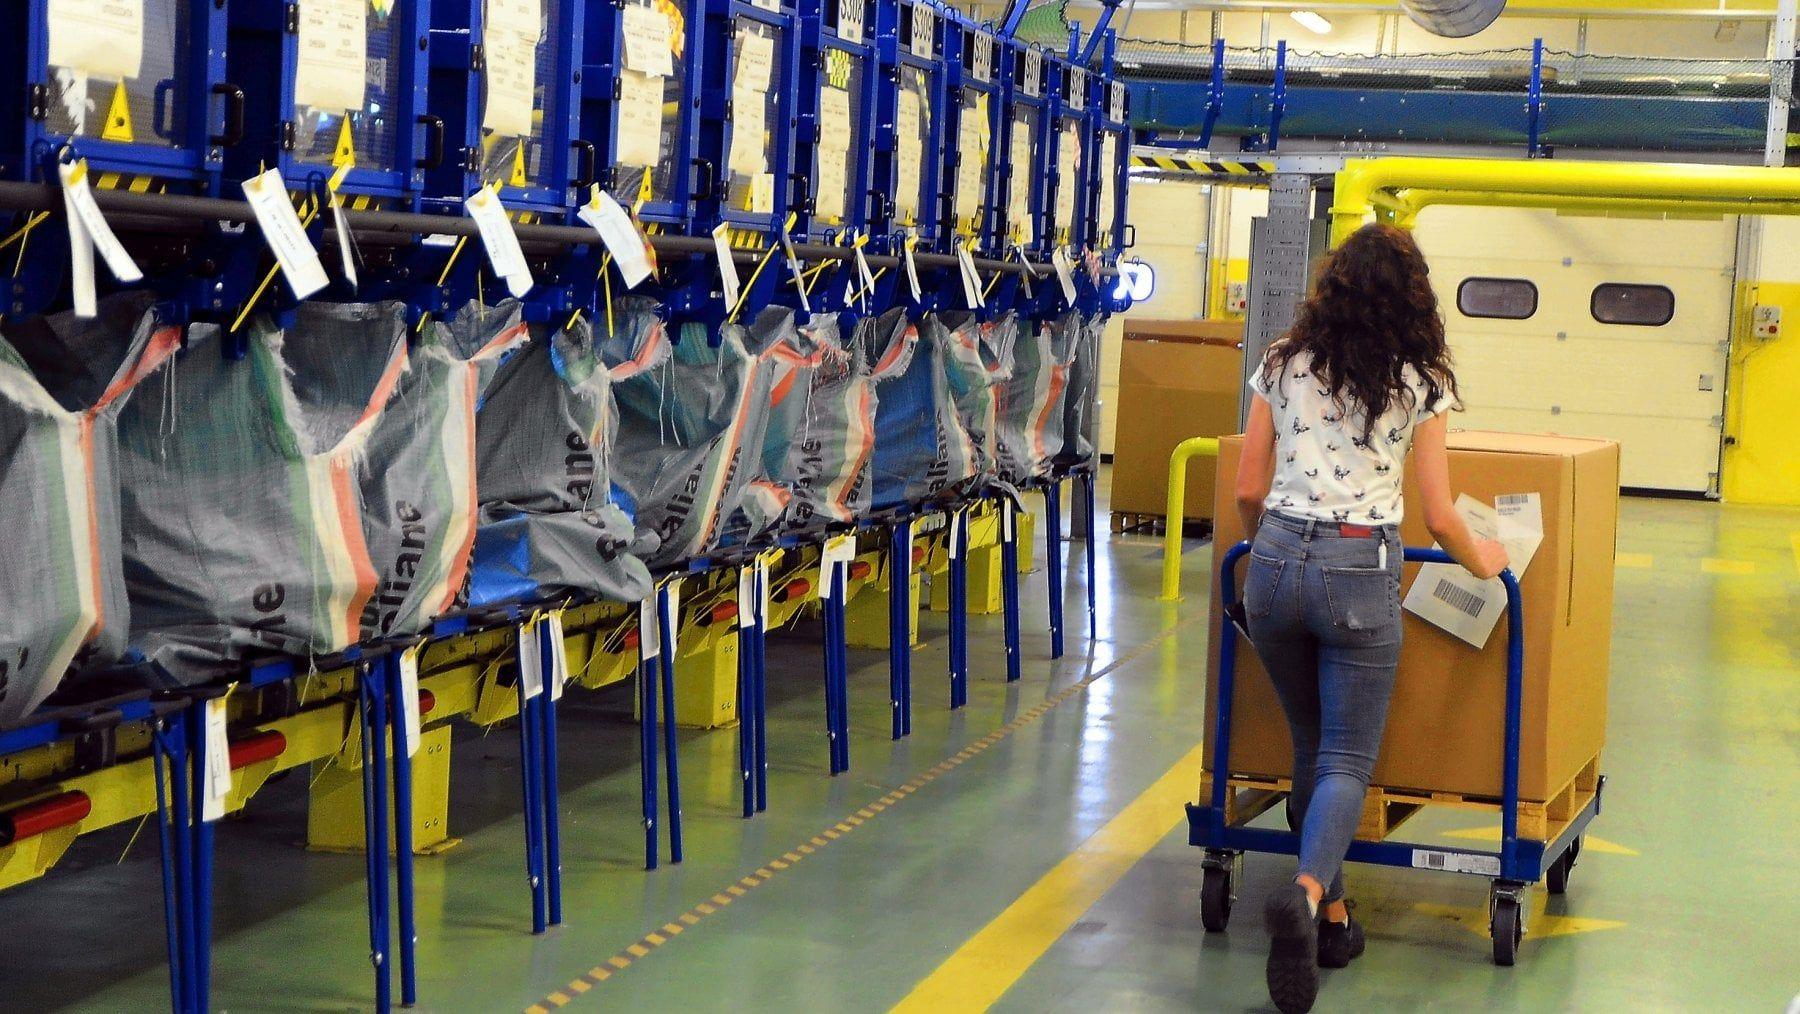 Robot in posta smista 15 mila pacchi all'ora